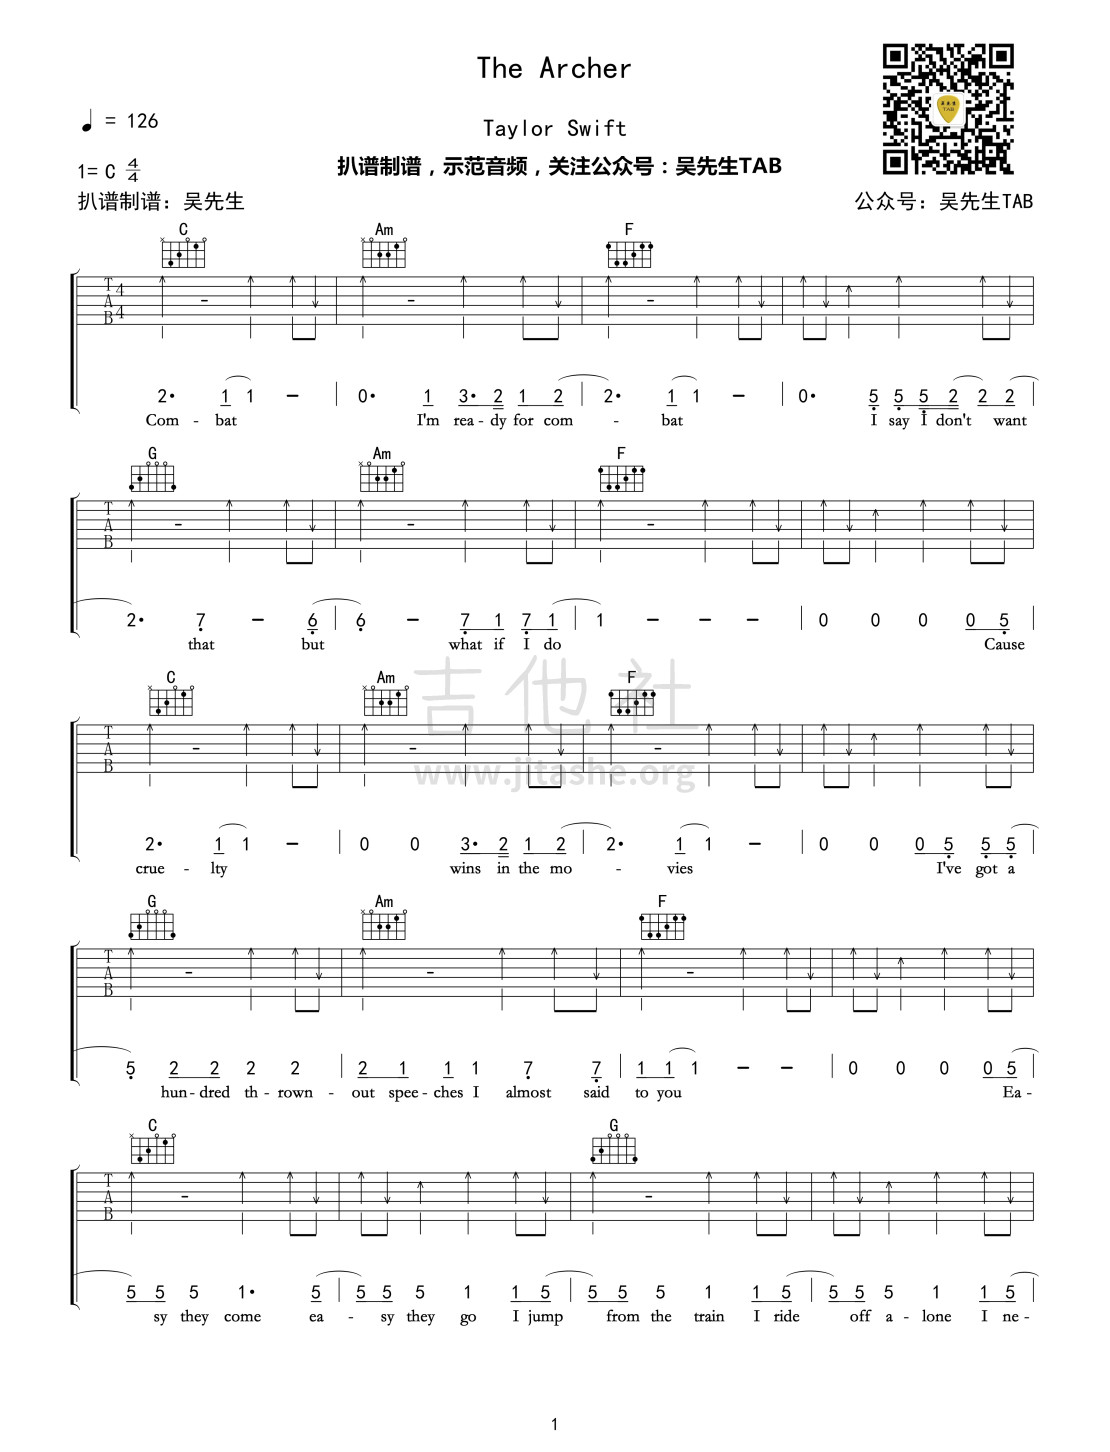 The Archer吉他谱(图片谱,弹唱)_Taylor Swift(泰勒·史薇芙特;泰勒·斯威夫特)_The Archer01.jpg